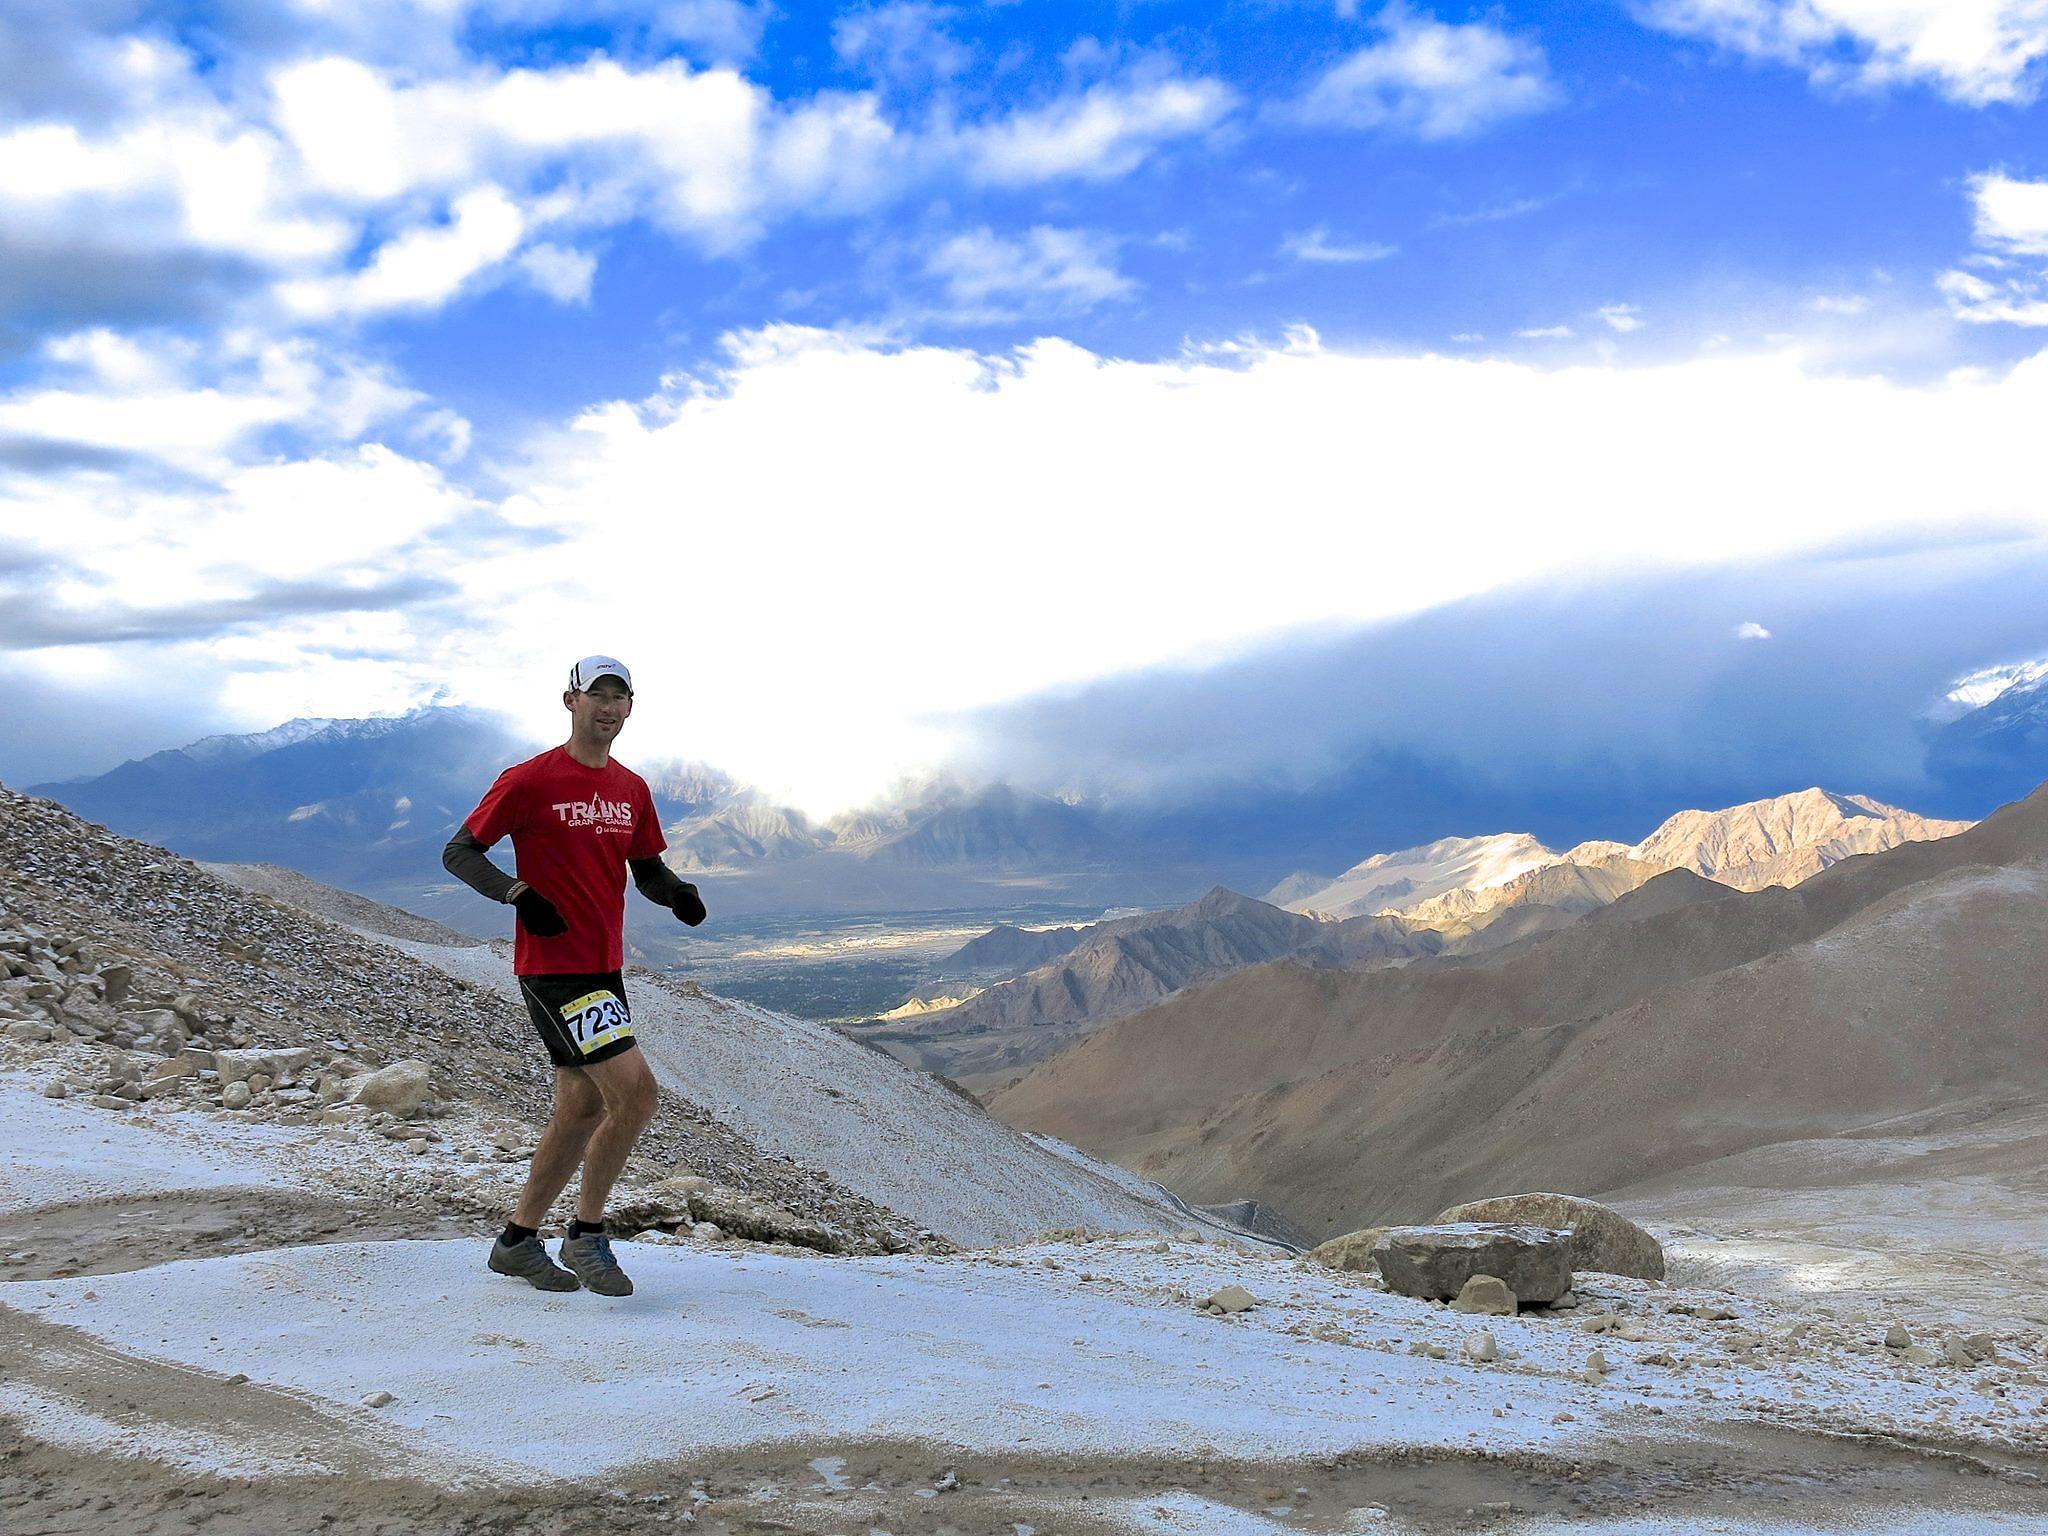 Khardung La Challenge: The ultimate test of human endurance. (Source: Facebook/Ladakh Marathon)